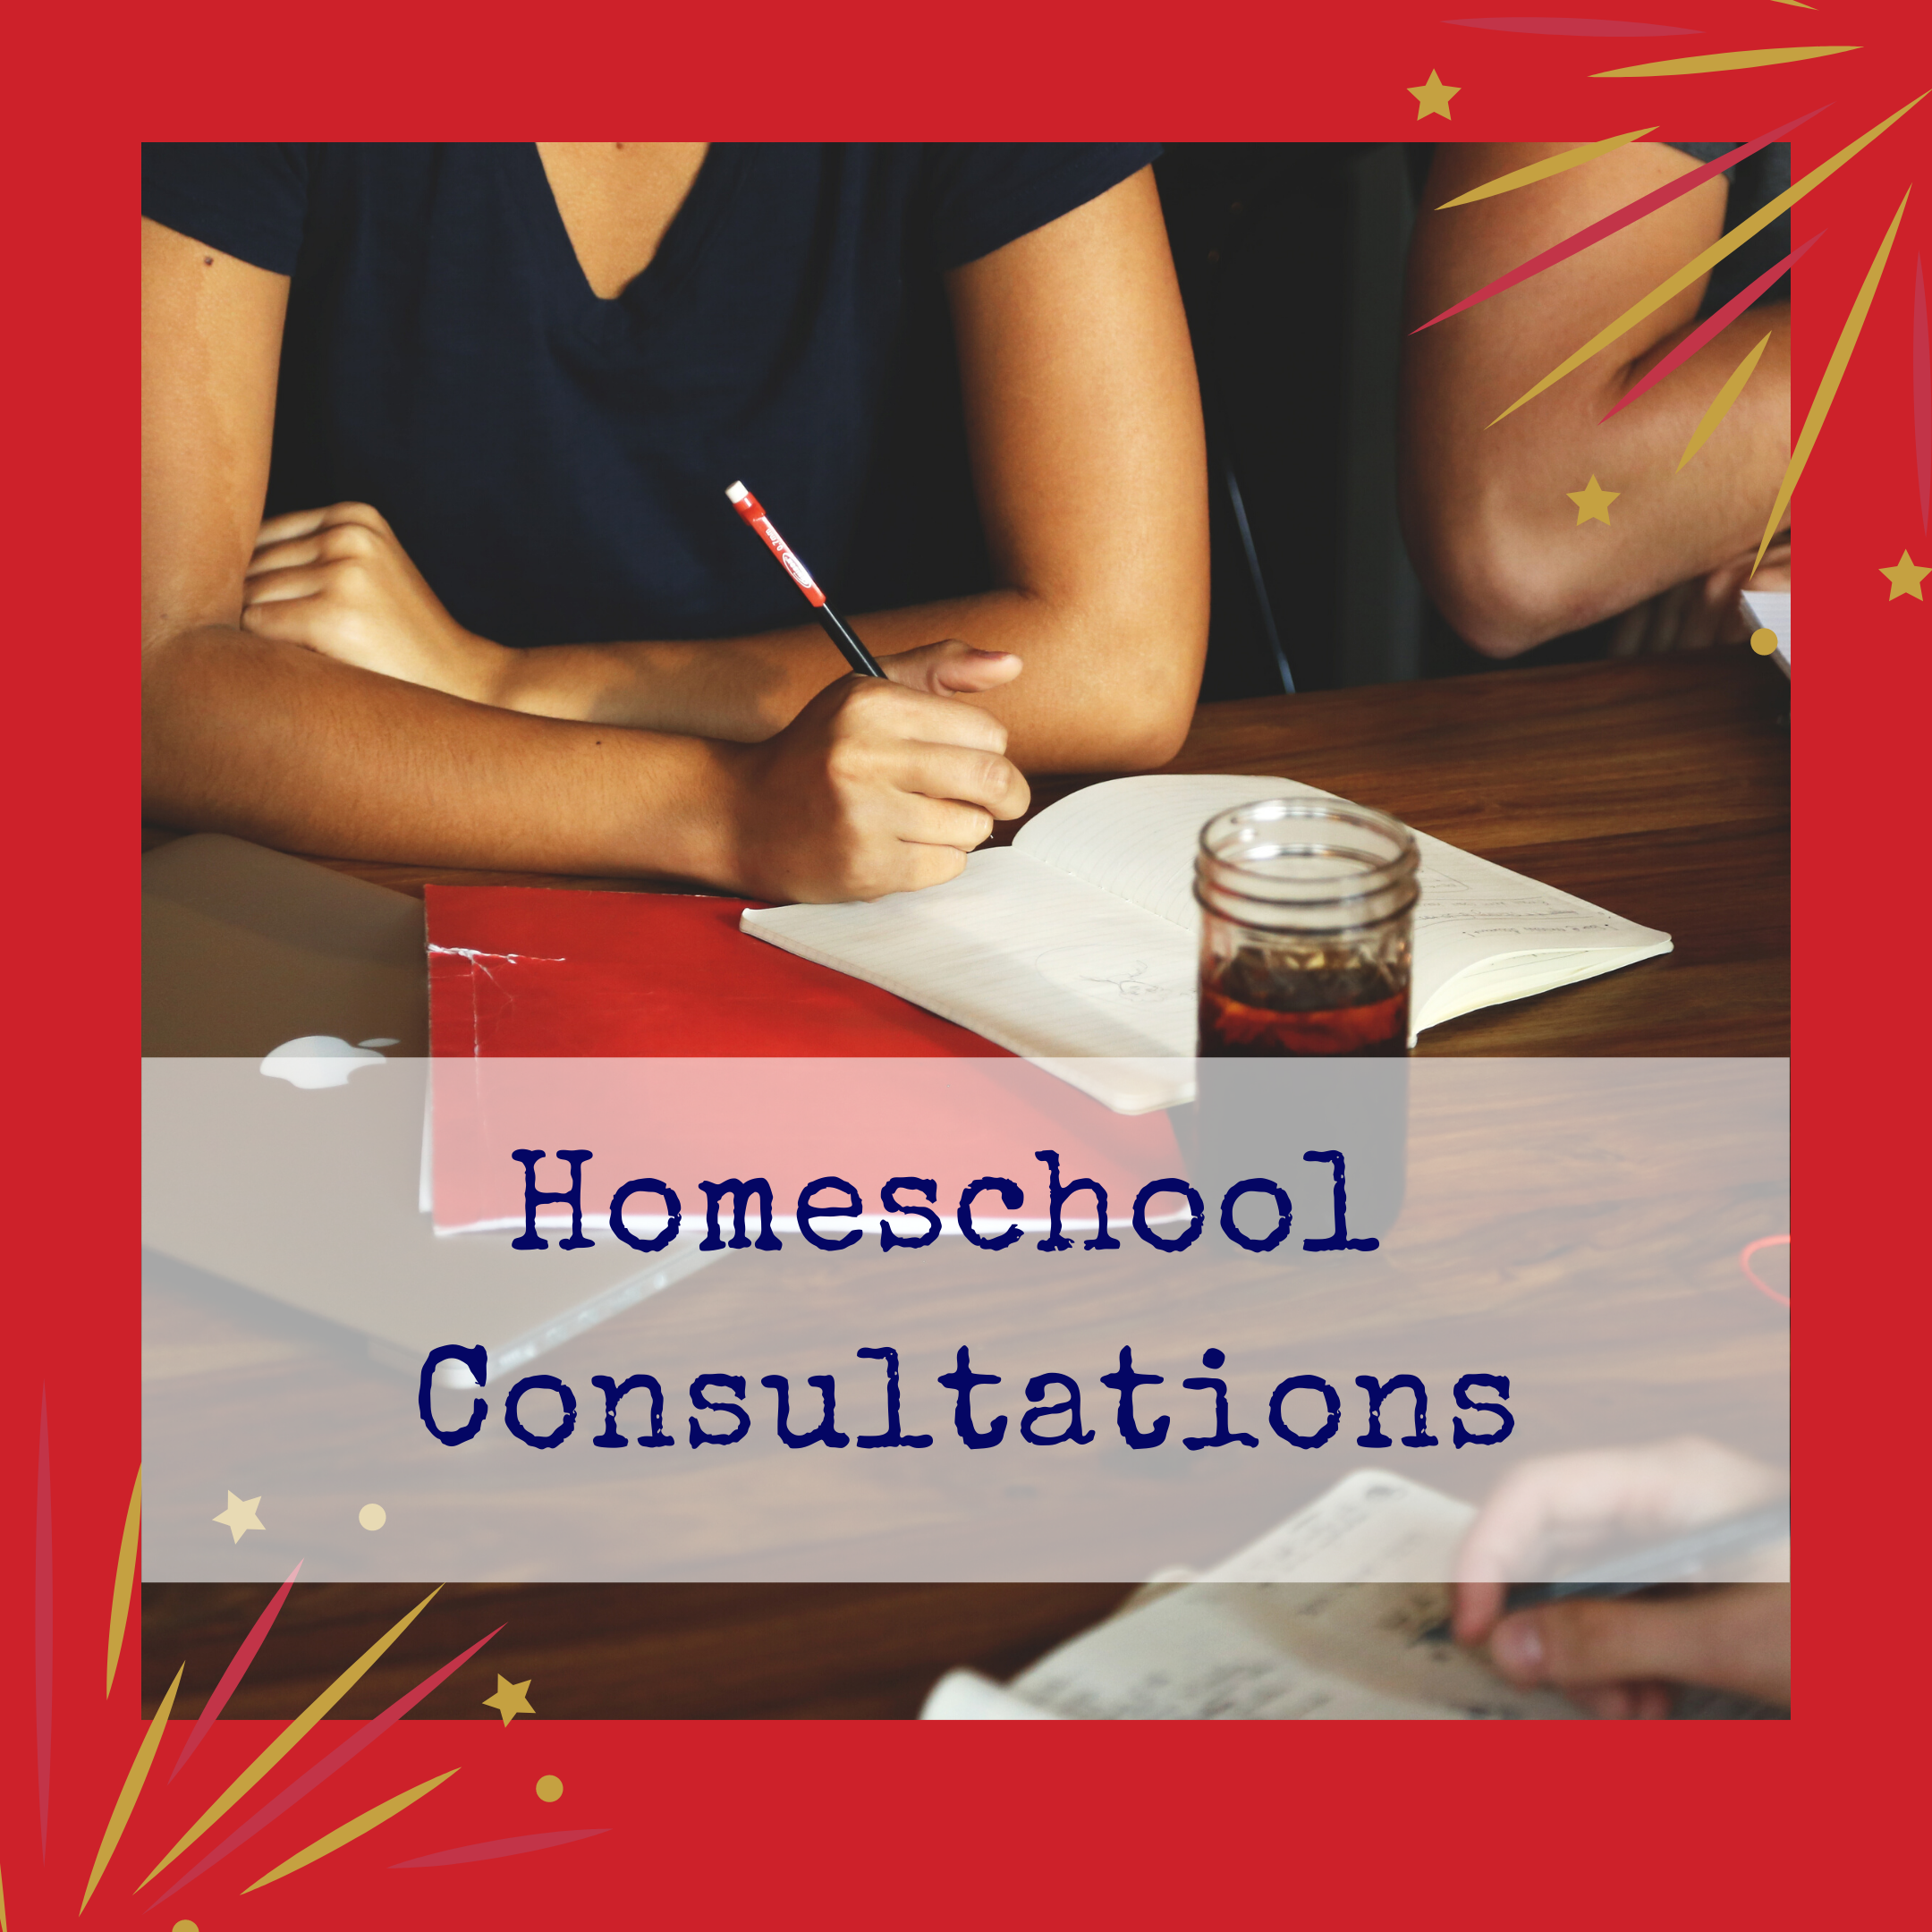 Homeschool Consultation